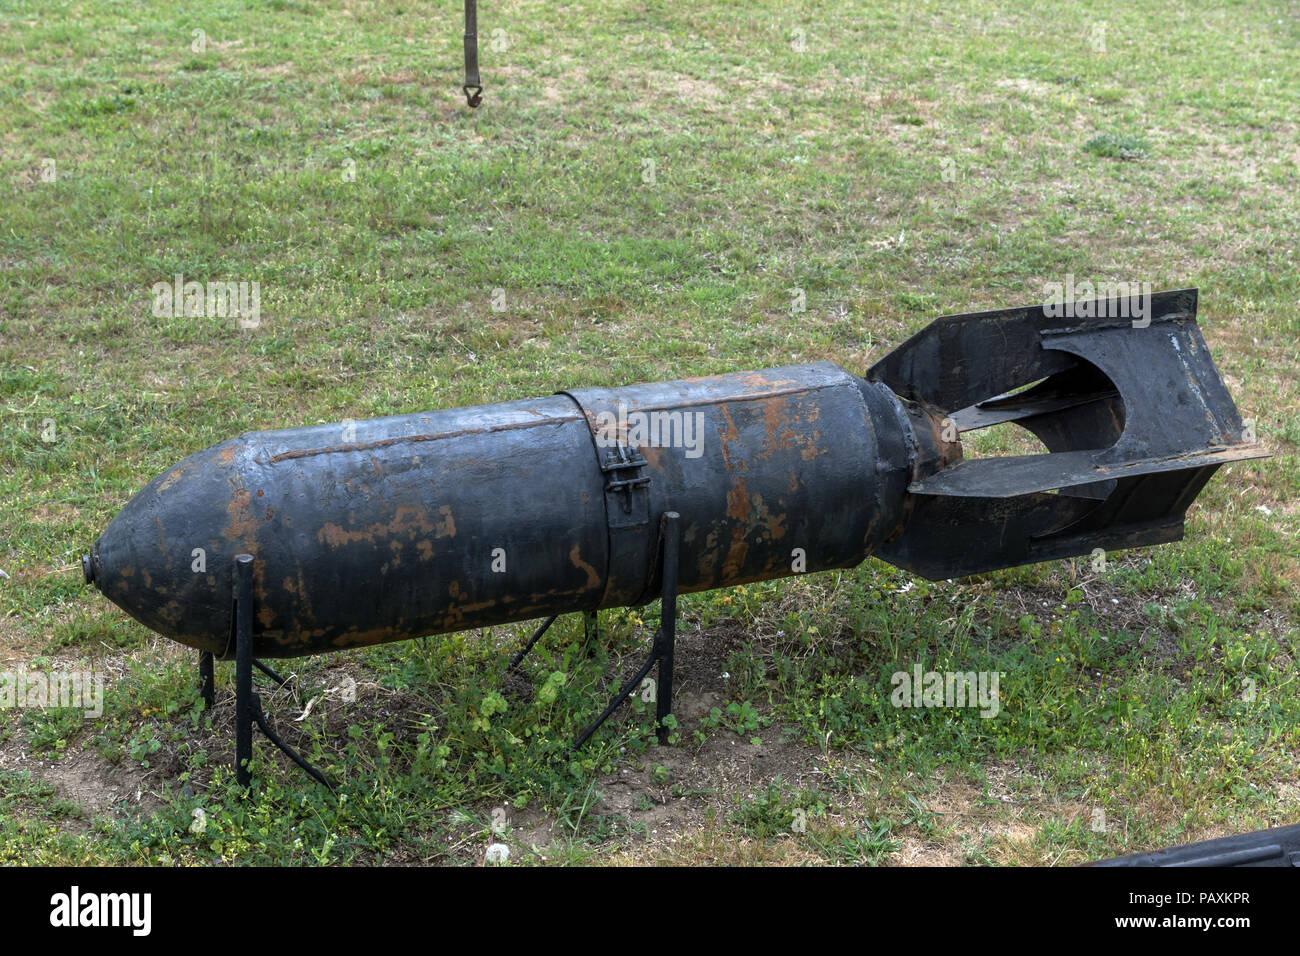 KRUMOVO, PLOVDIV, BULGARIA - 29 APRIL 2017: Aviation bomb in Aviation Museum near Plovdiv Airport, Bulgaria Stock Photo